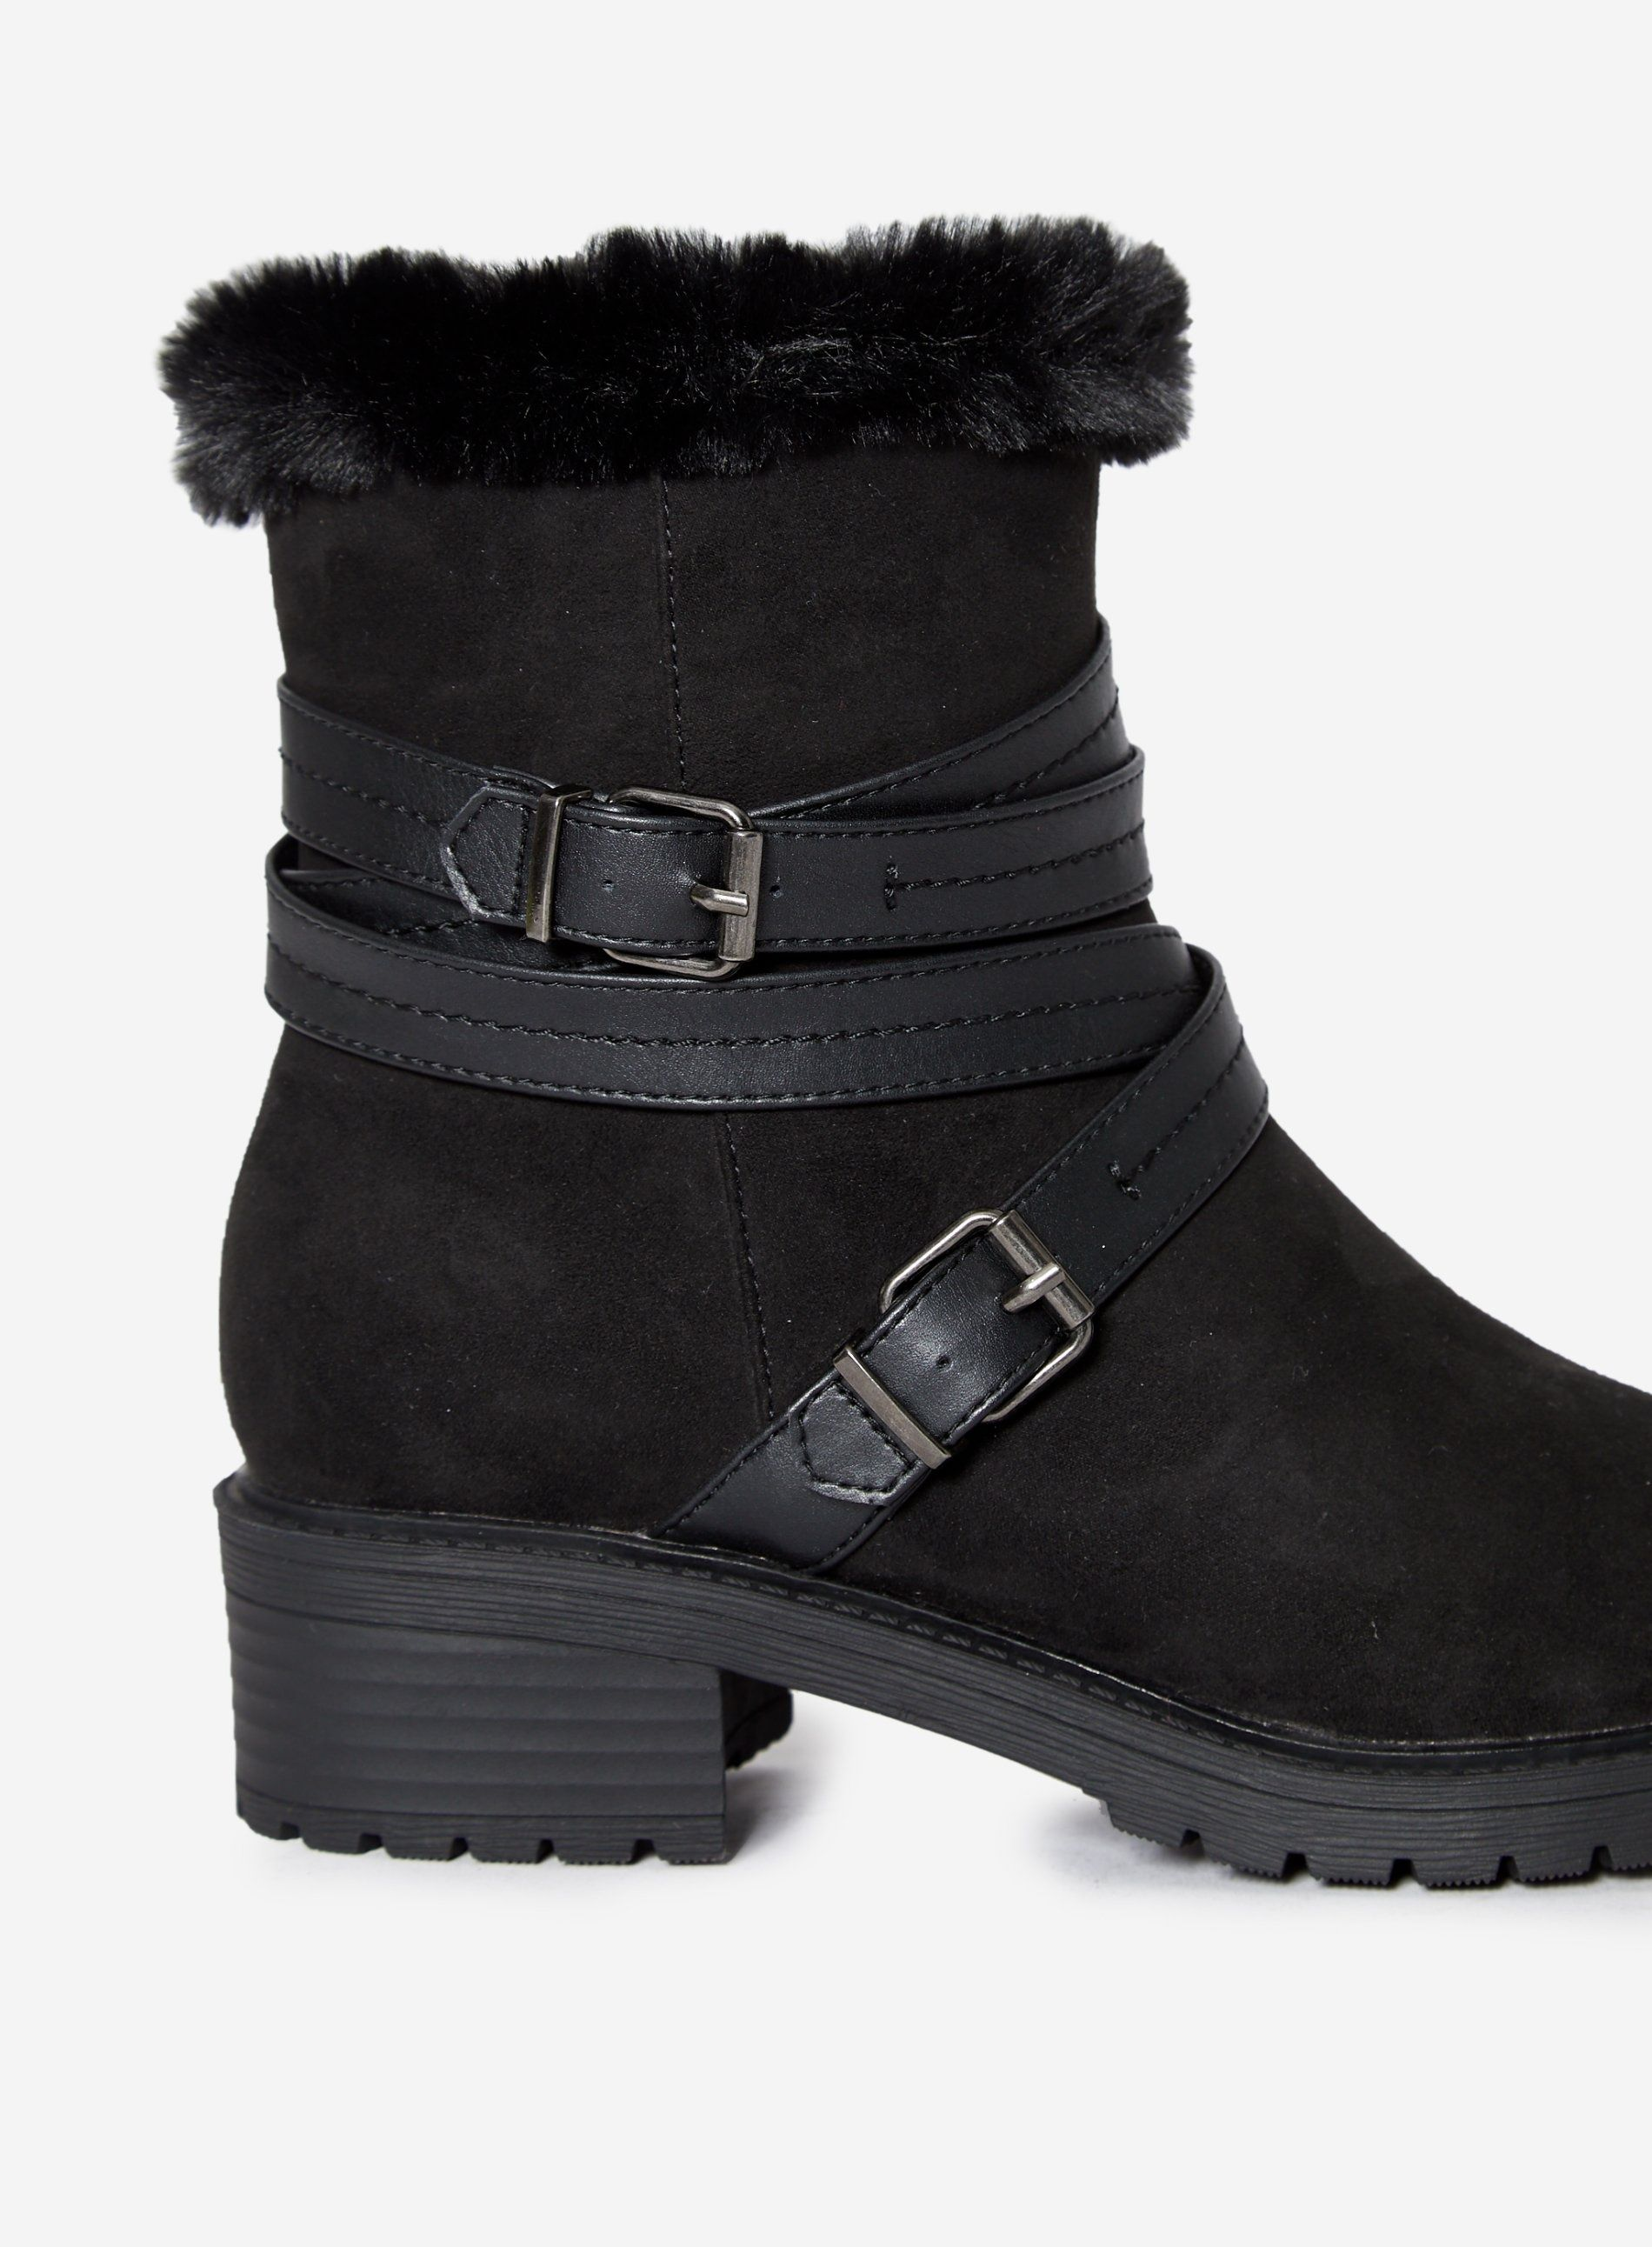 Dorothy Perkins Womens Black Maeva Cleat Block Heel Ankle Boots